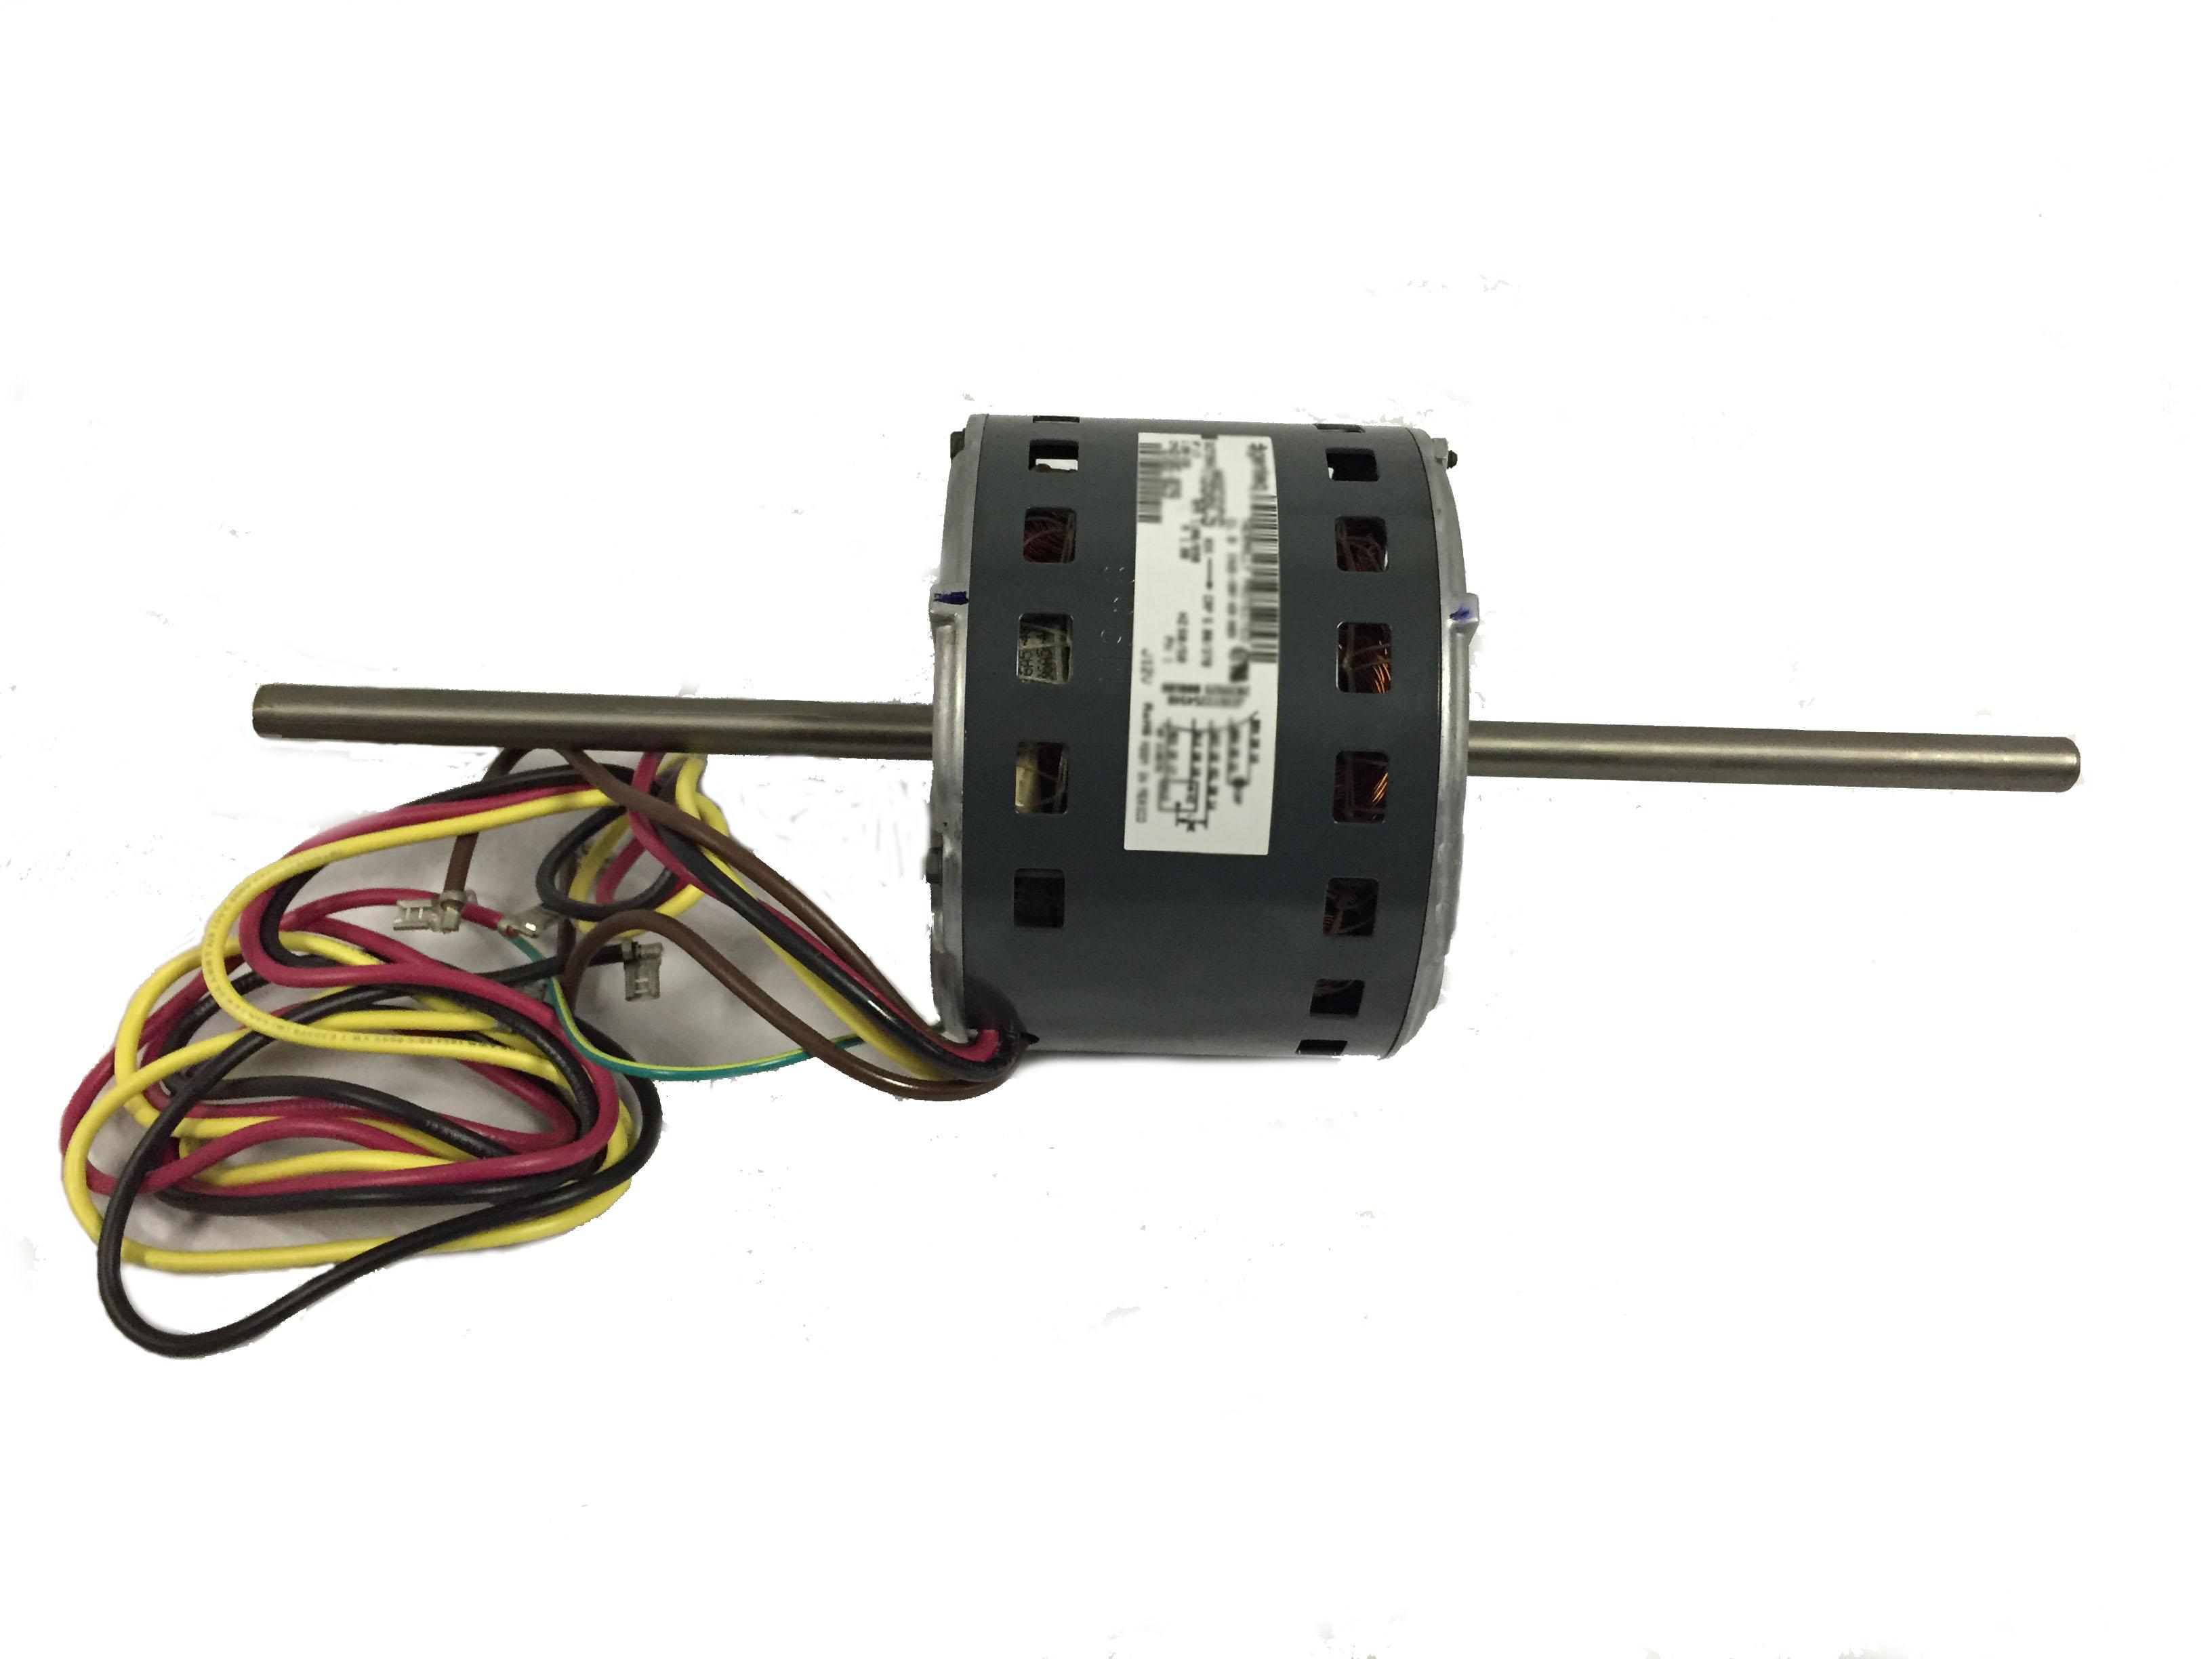 Double shaft fan blower motor 1 6hp 1075rpm 3 speed 208 230v for Blower motor mounting bracket